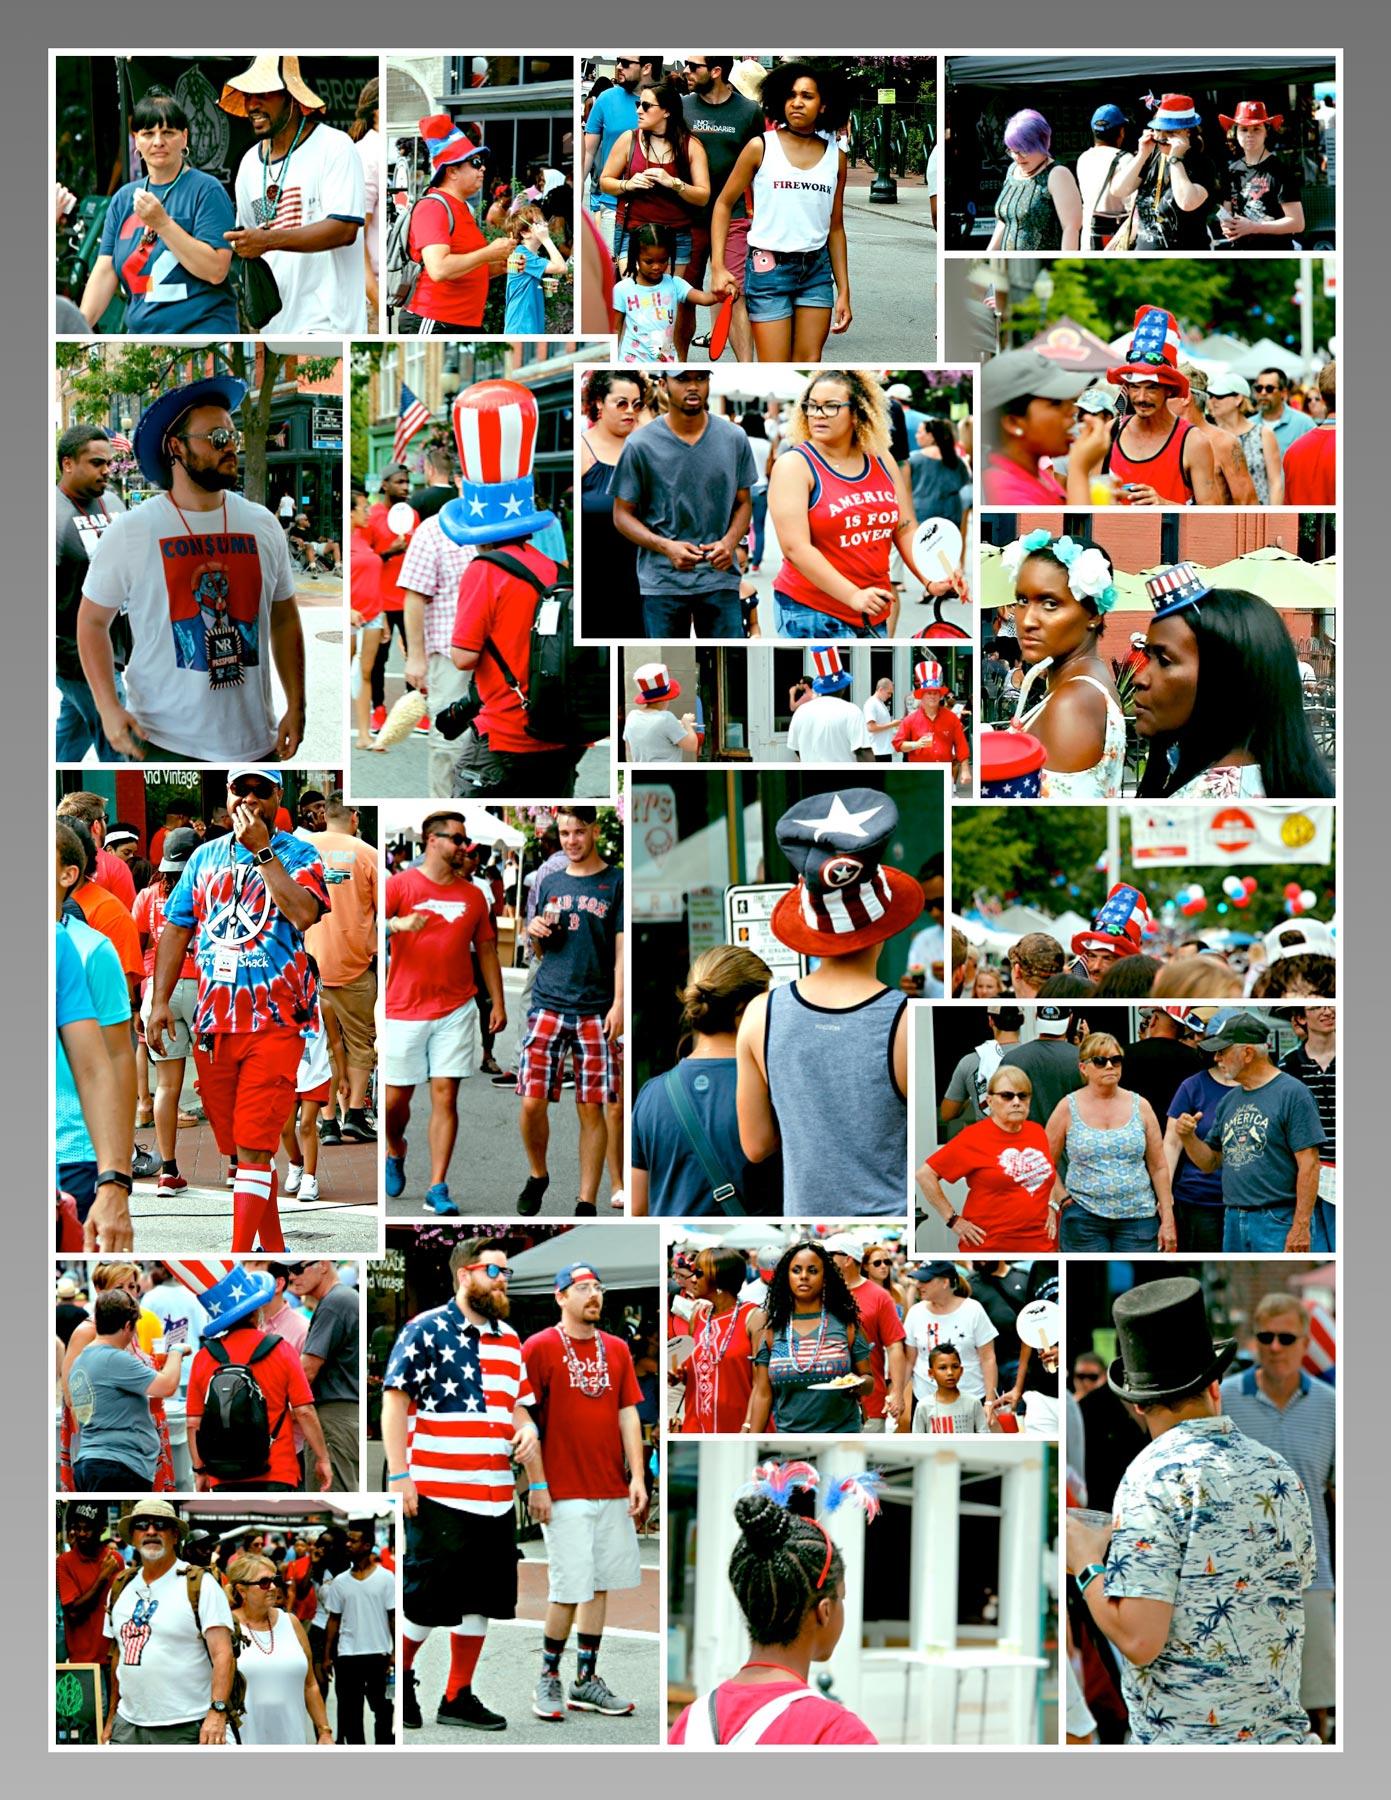 Greensboro-July-4-Fun-Hats-Shirts.jpg